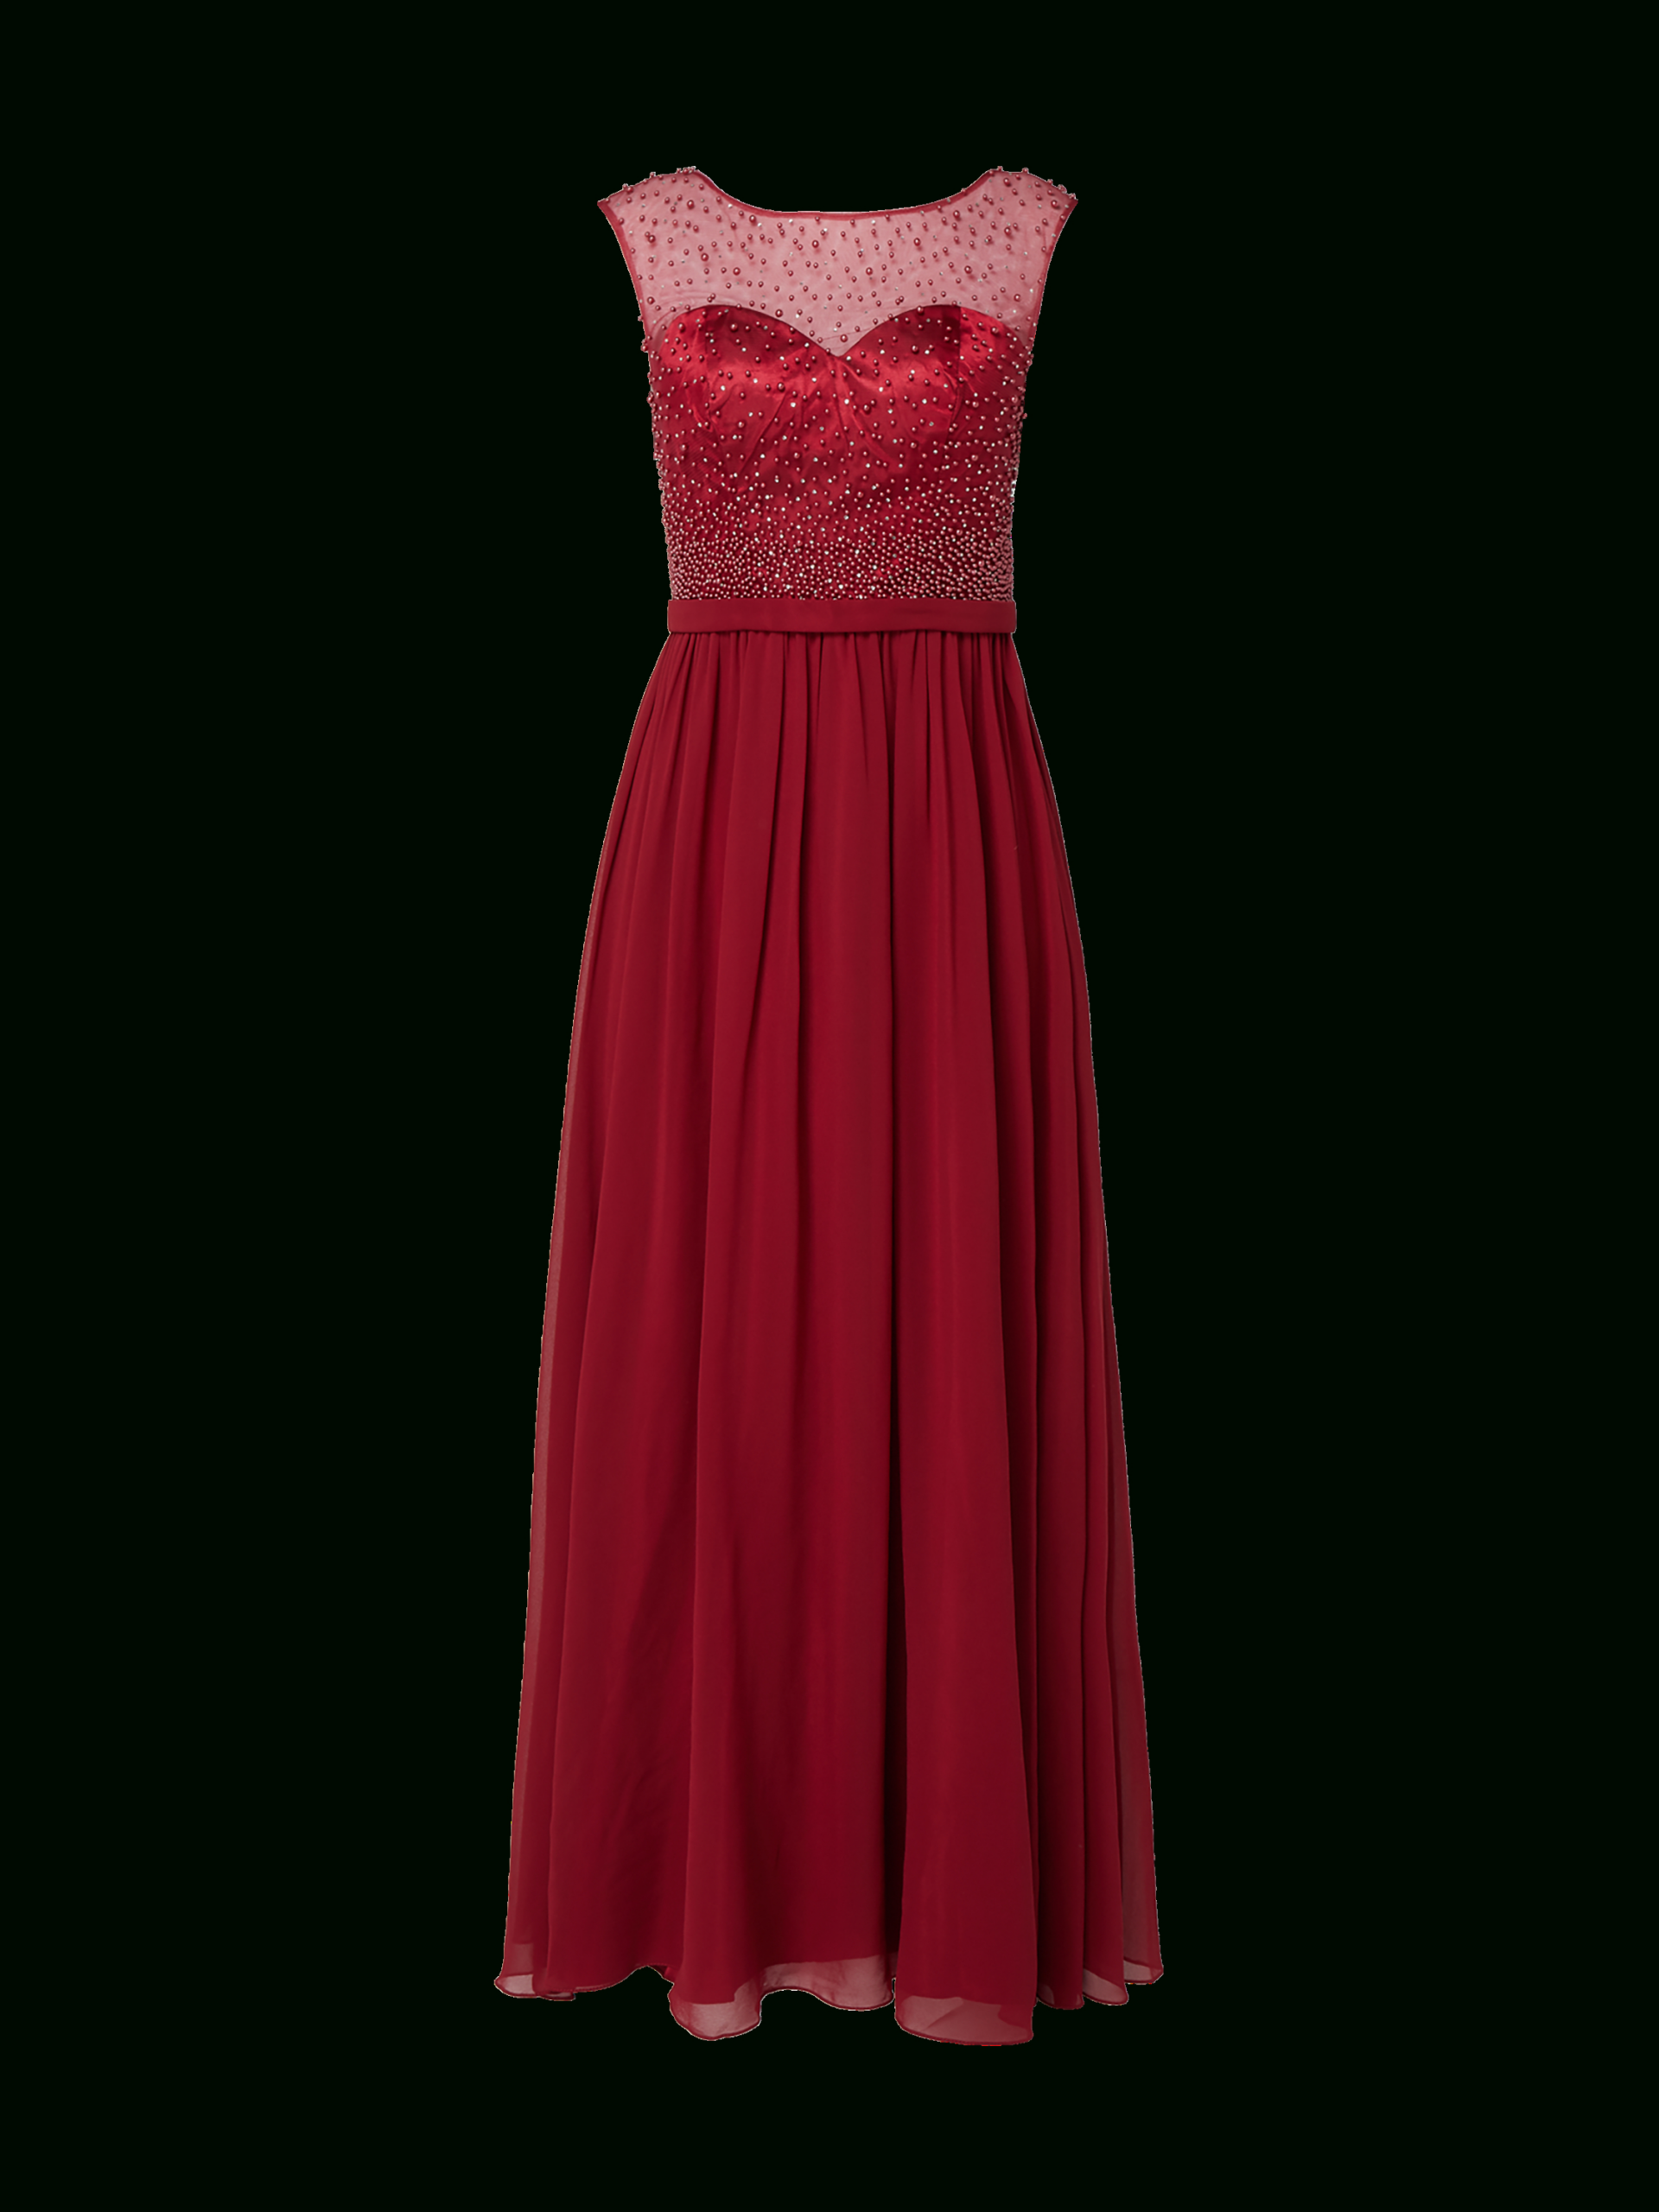 Abend Top Abendkleid Dunkelrot Vertrieb10 Perfekt Abendkleid Dunkelrot Design